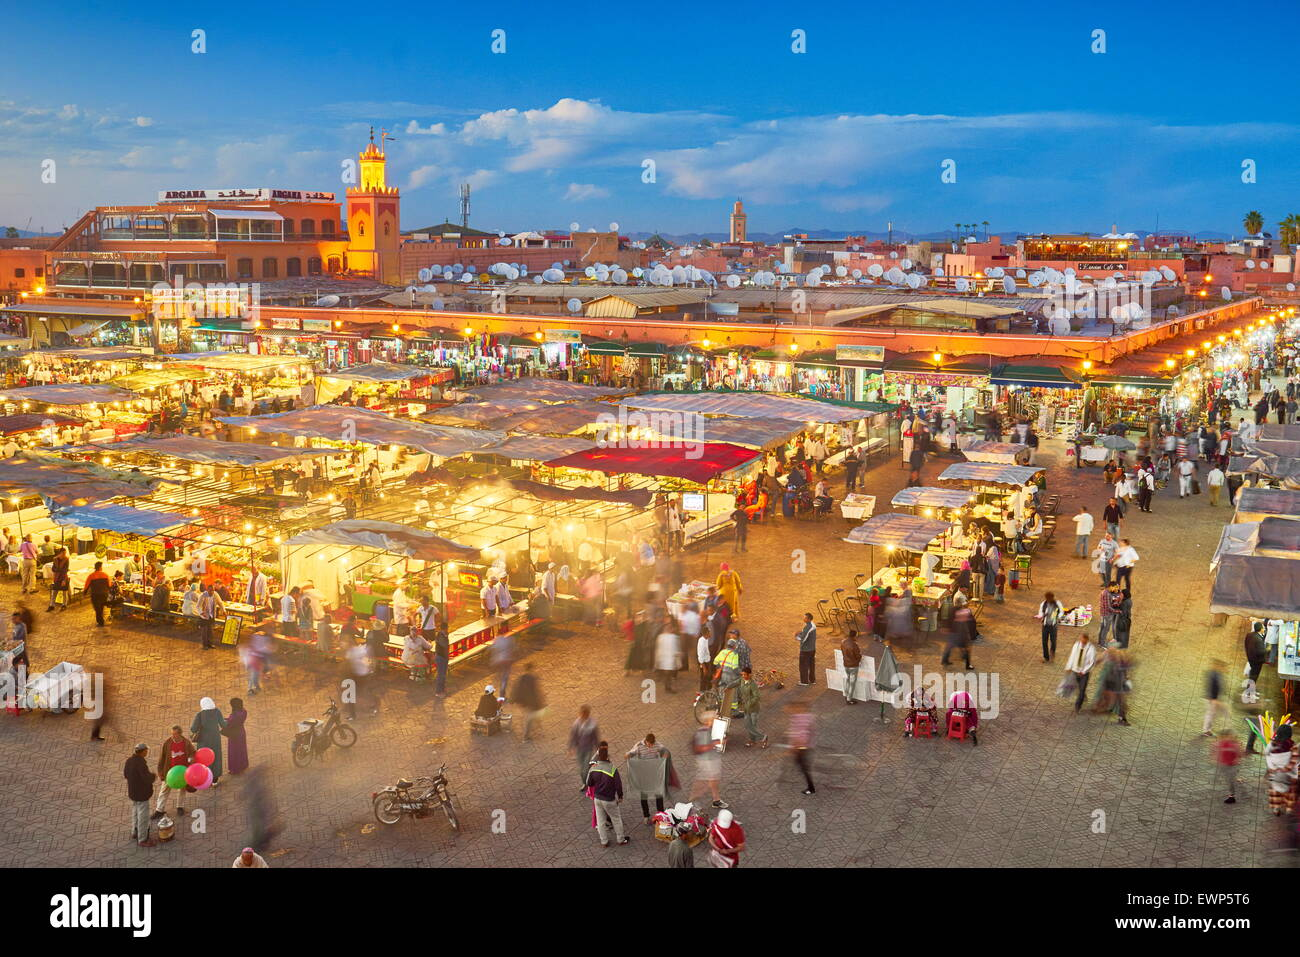 Plaza Djemaa el-Fna al atardecer, Medina Marrakech, Marruecos, África Imagen De Stock